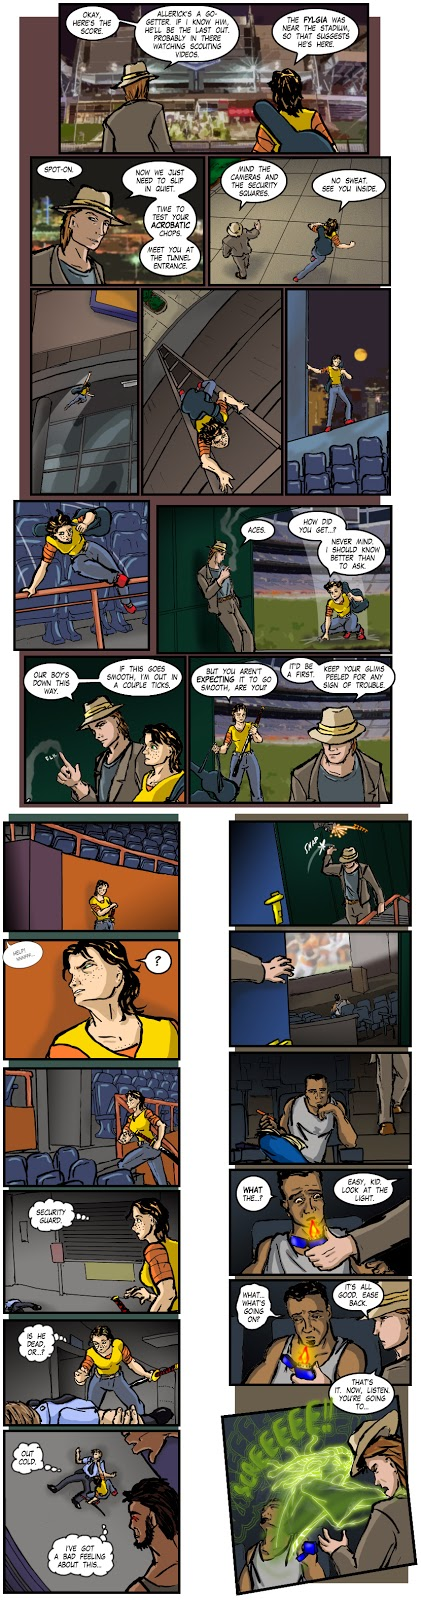 http://talesfromthevault.com/thunderstruck/comic705.html